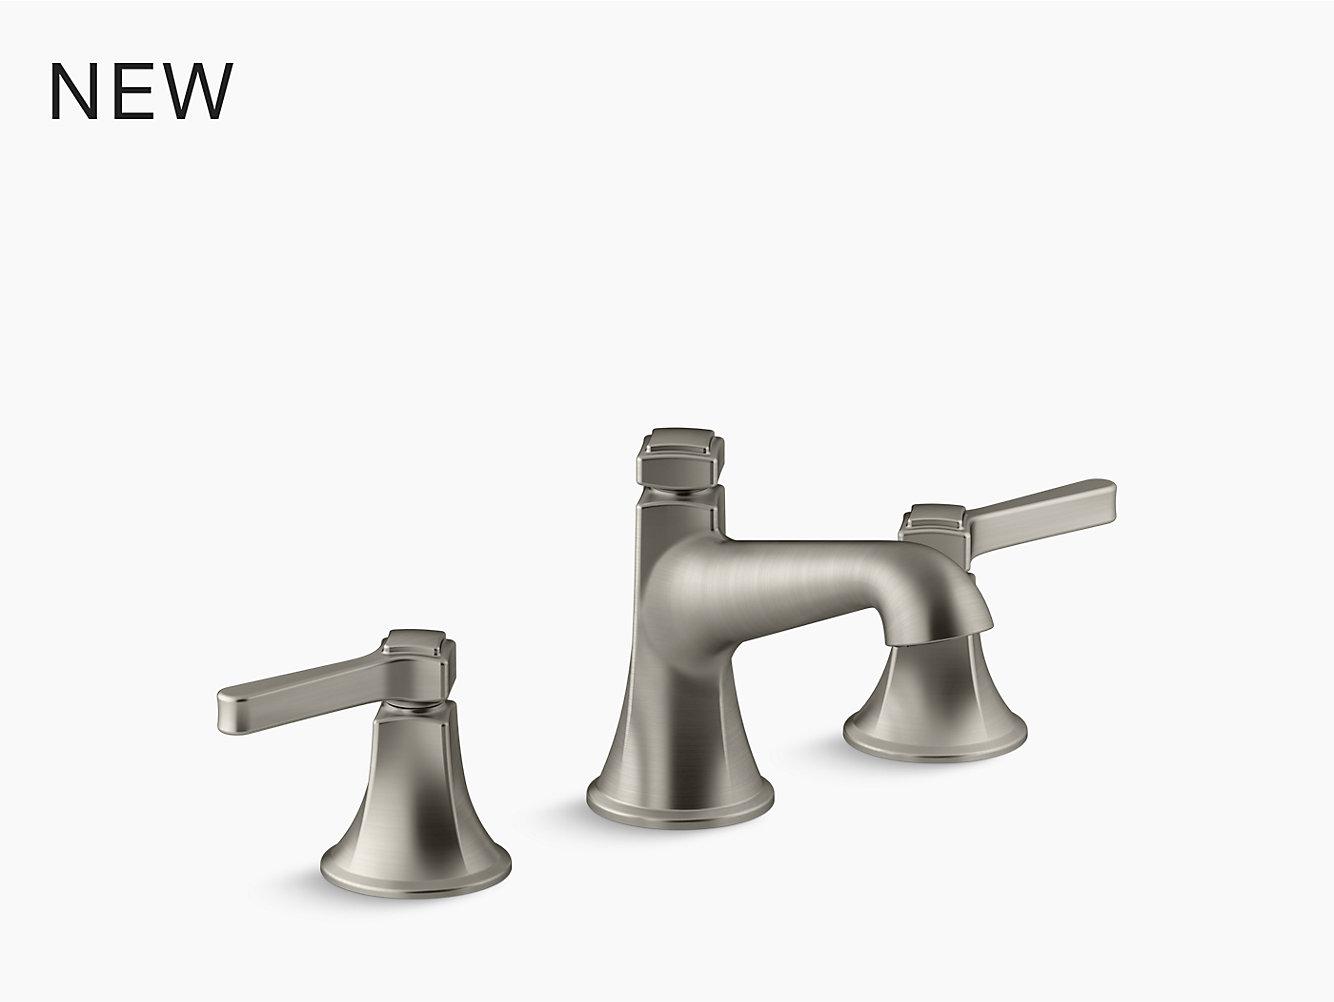 k 72218 sensate touchless pull down kitchen sink faucet kohler view larger